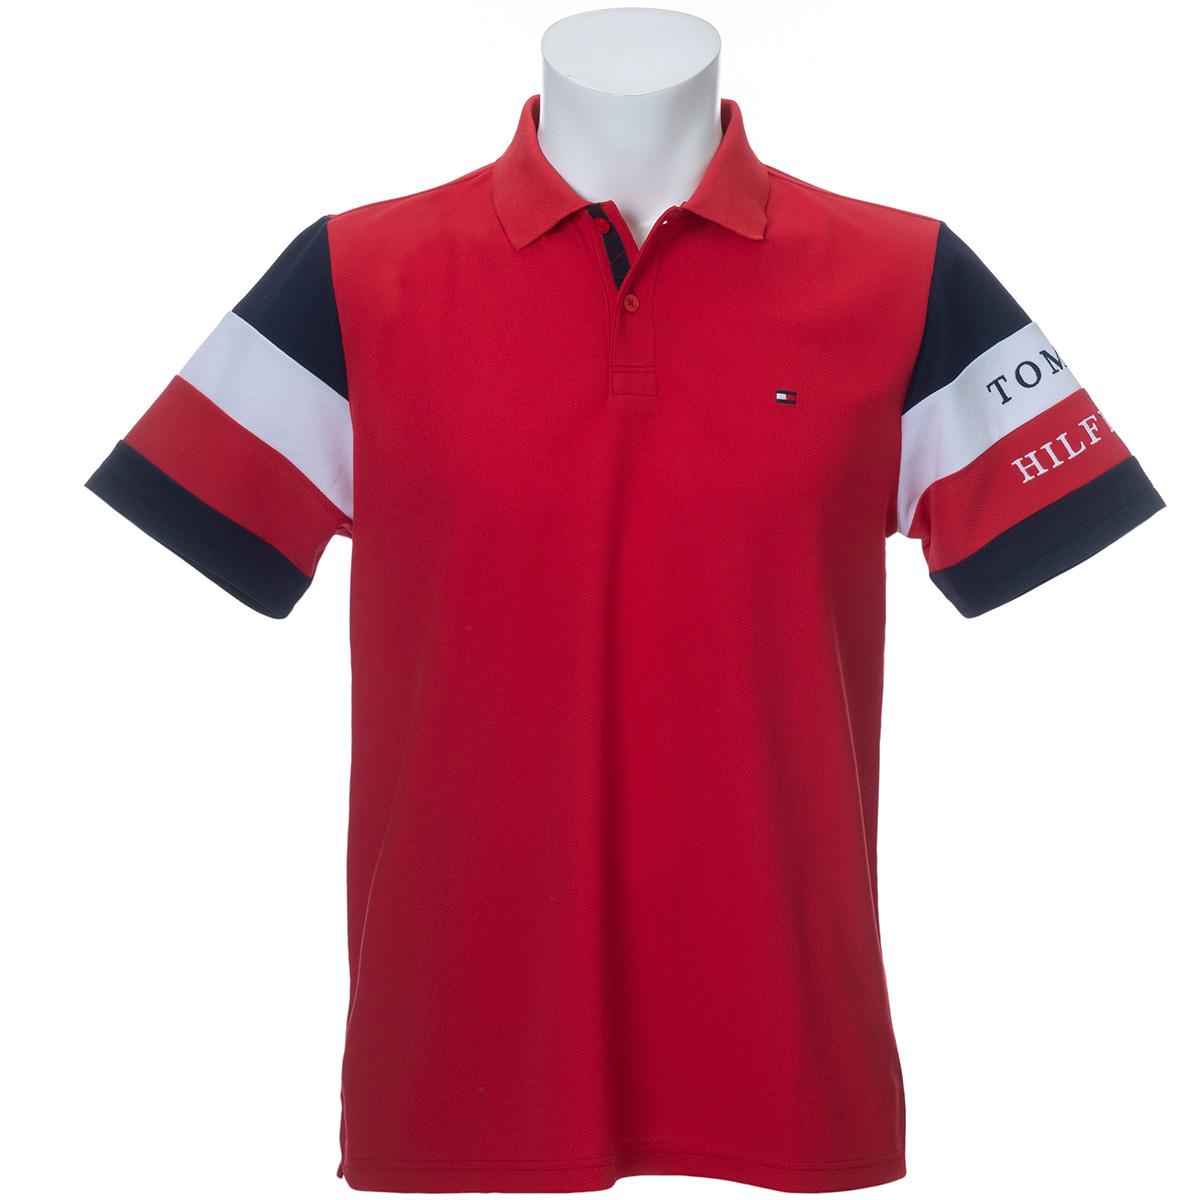 SIGNATURE ストライプスリーブ 半袖ポロシャツ